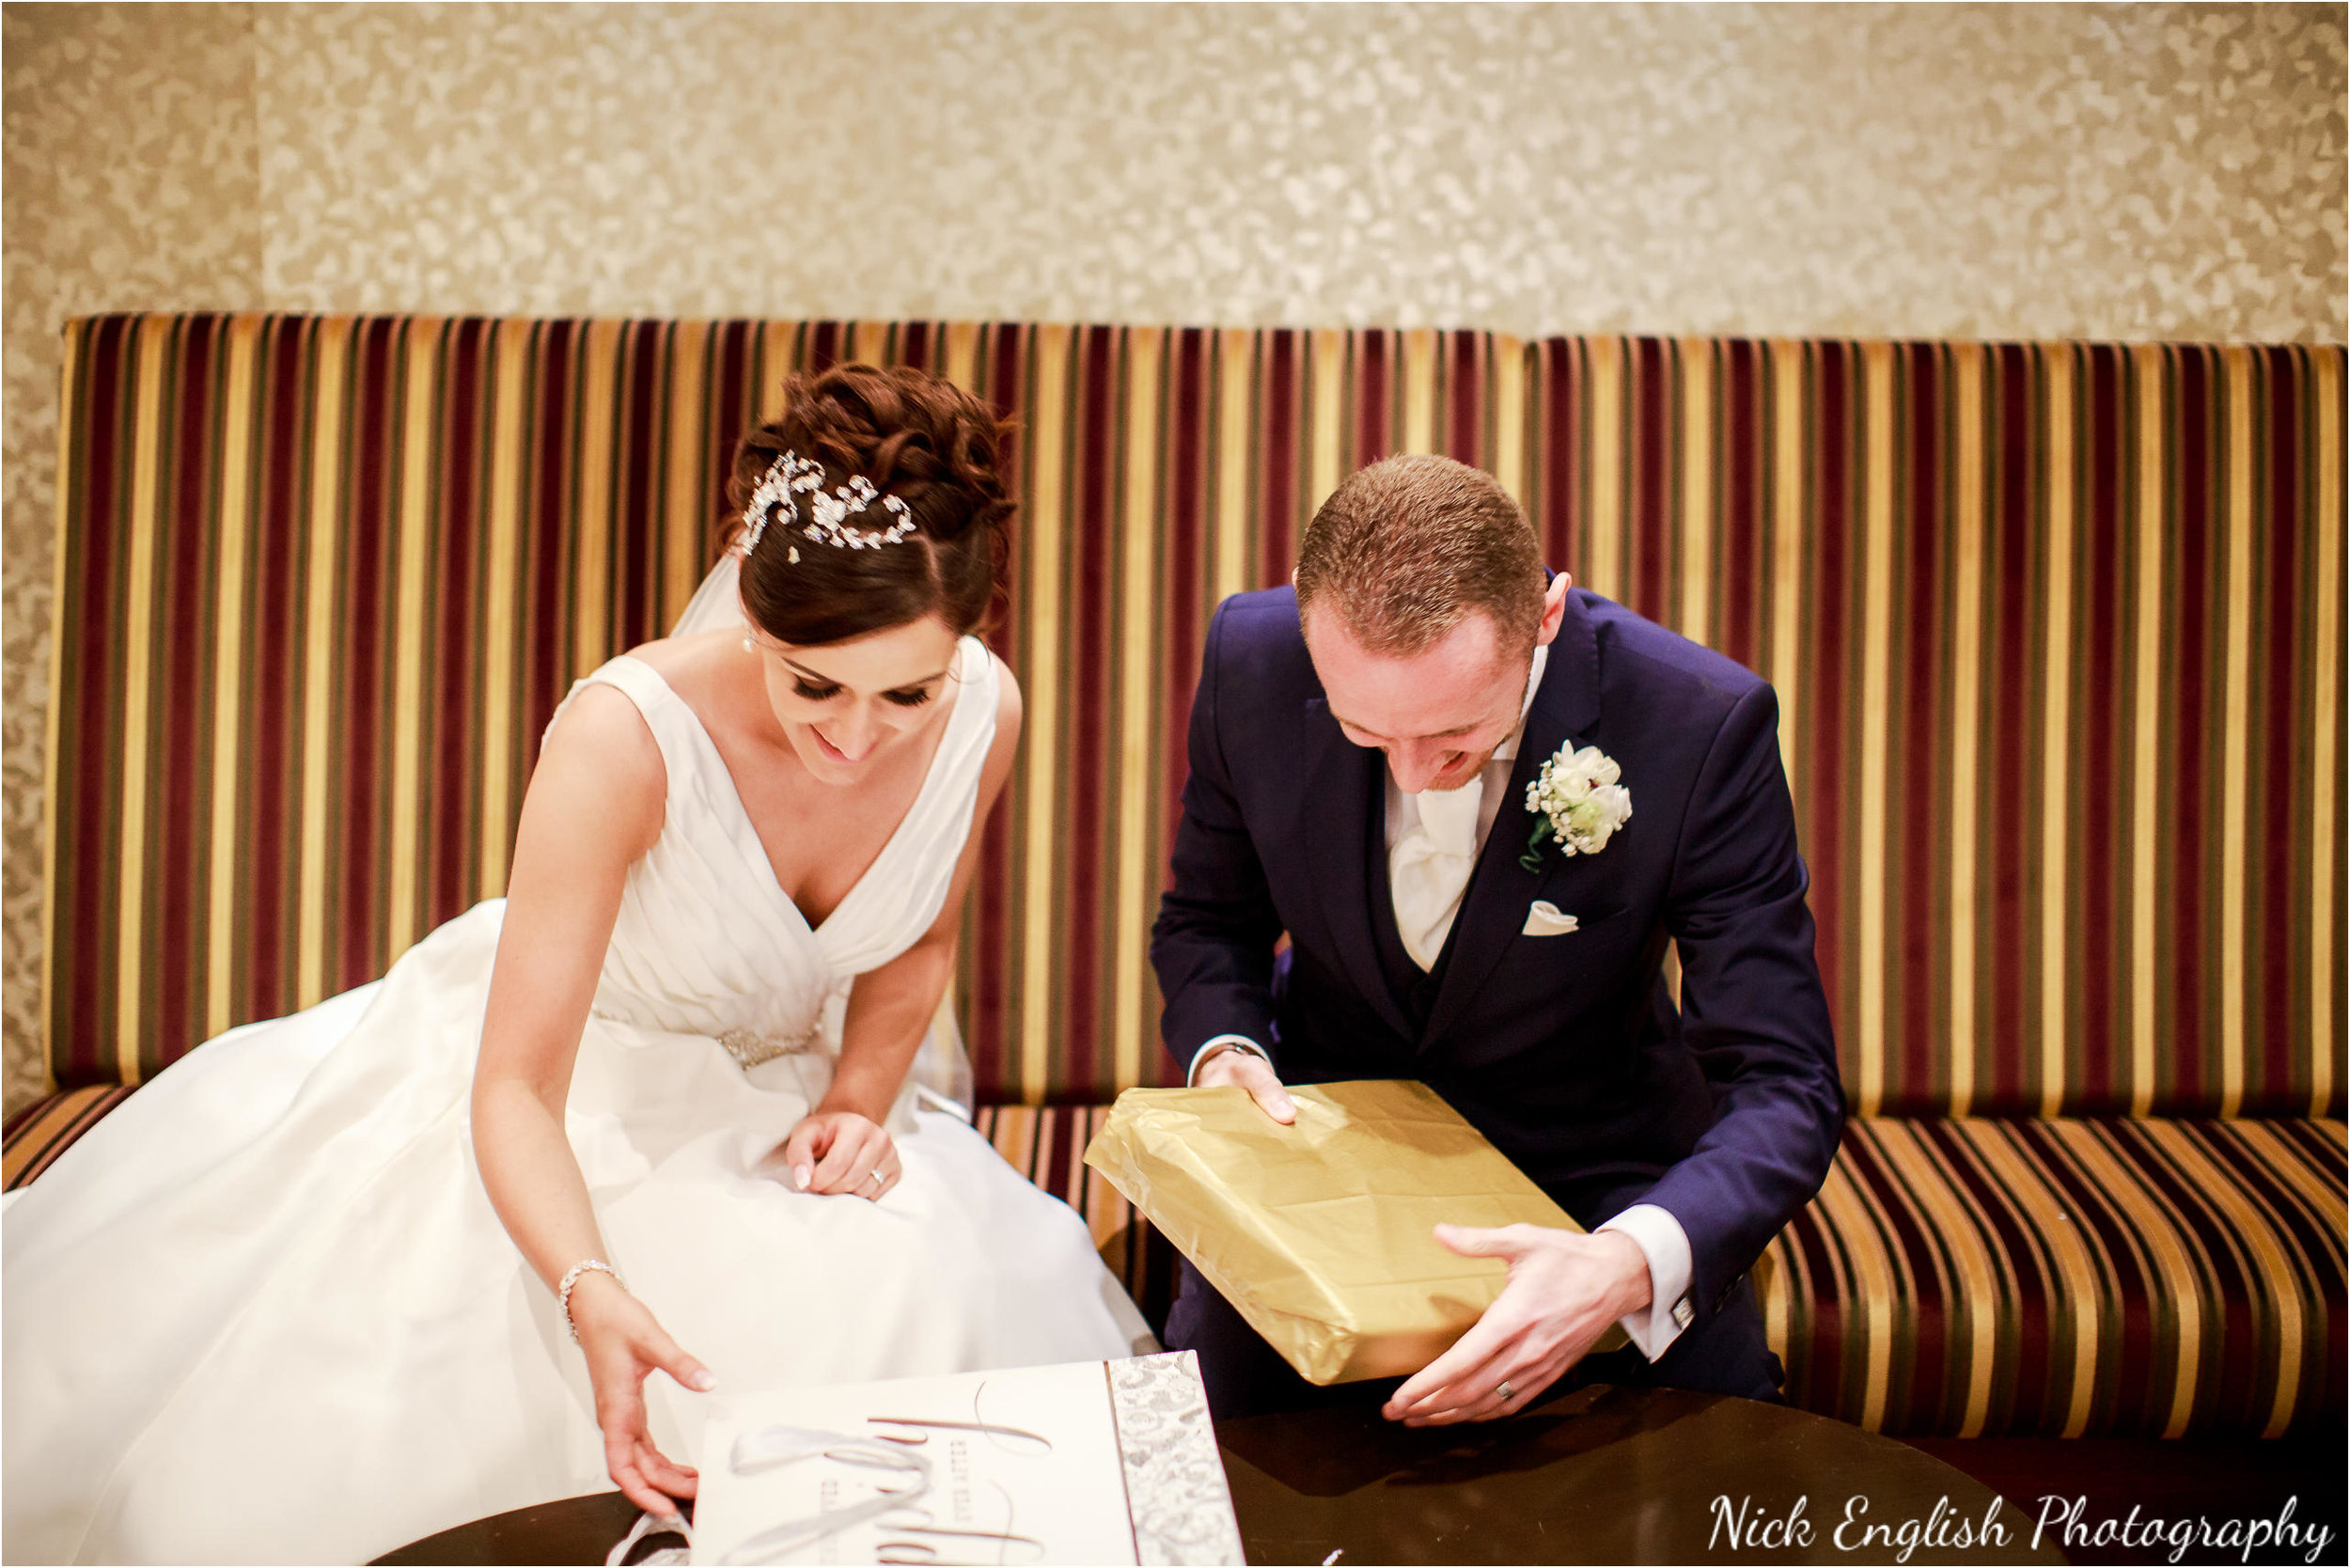 Emily David Wedding Photographs at Barton Grange Preston by Nick English Photography 160jpg.jpeg